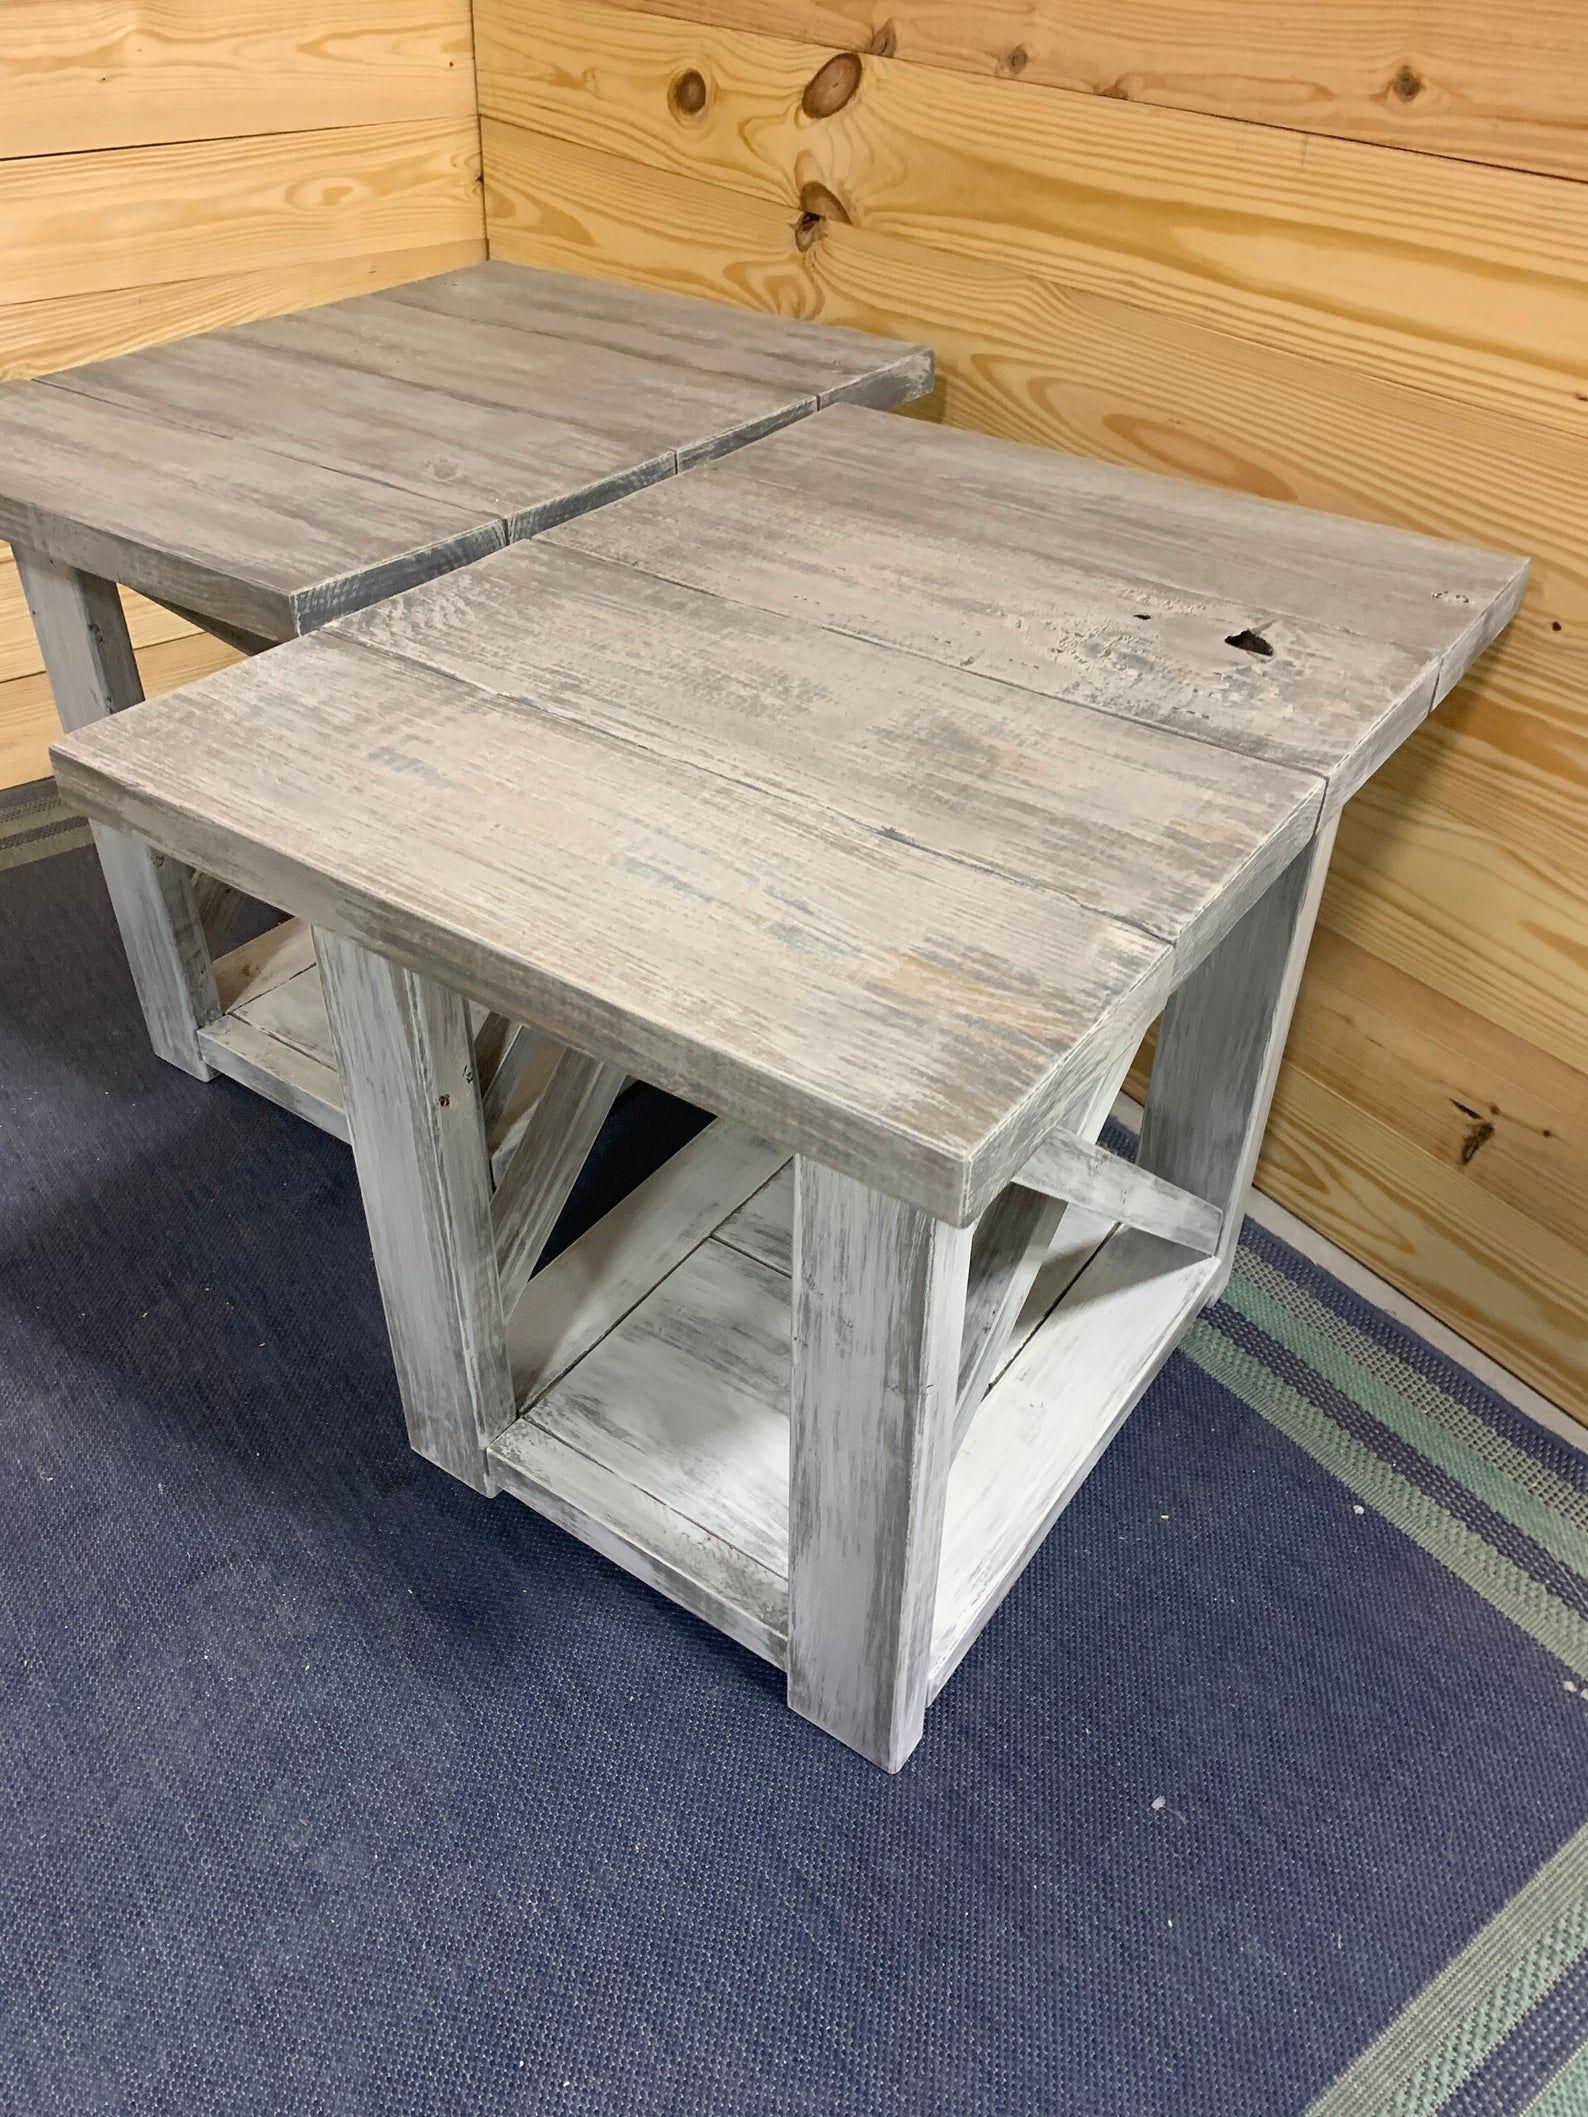 Long Rustic Farmhouse End Tables Gray White Wash Top With A Etsy In 2021 Farmhouse End Tables Rustic End Tables Coffee Table Farmhouse [ 2117 x 1588 Pixel ]